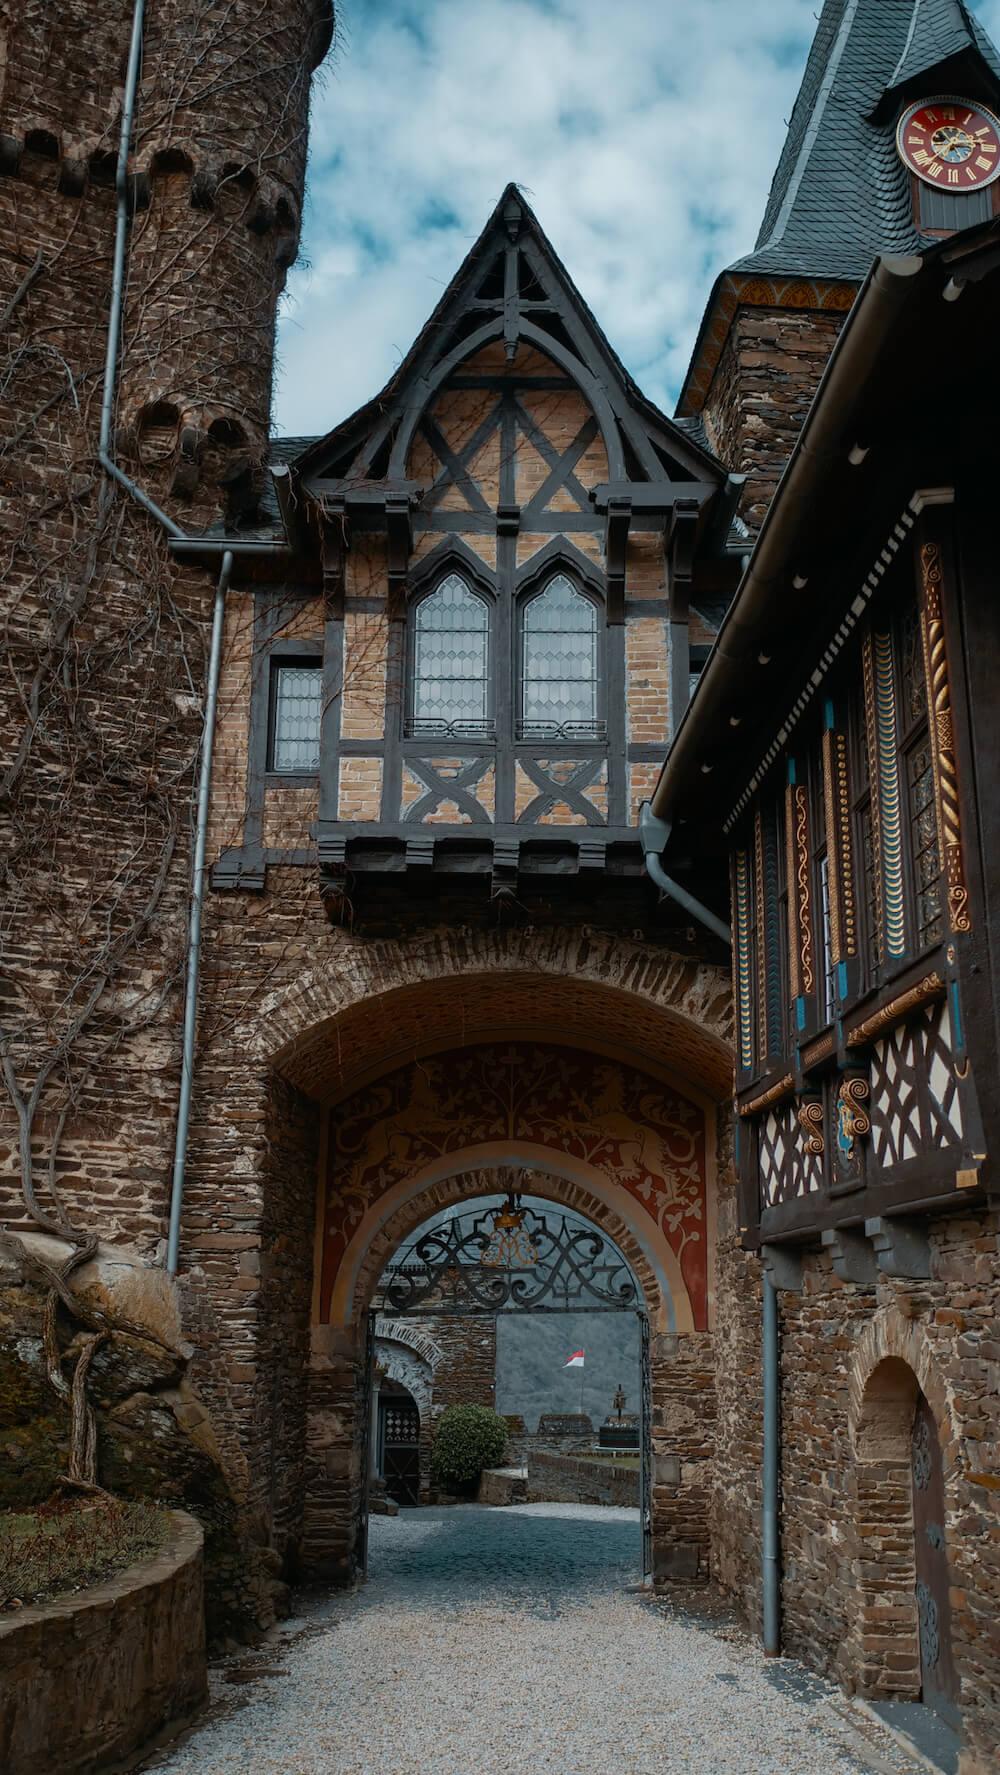 Rijksburch Cochem in duitsland